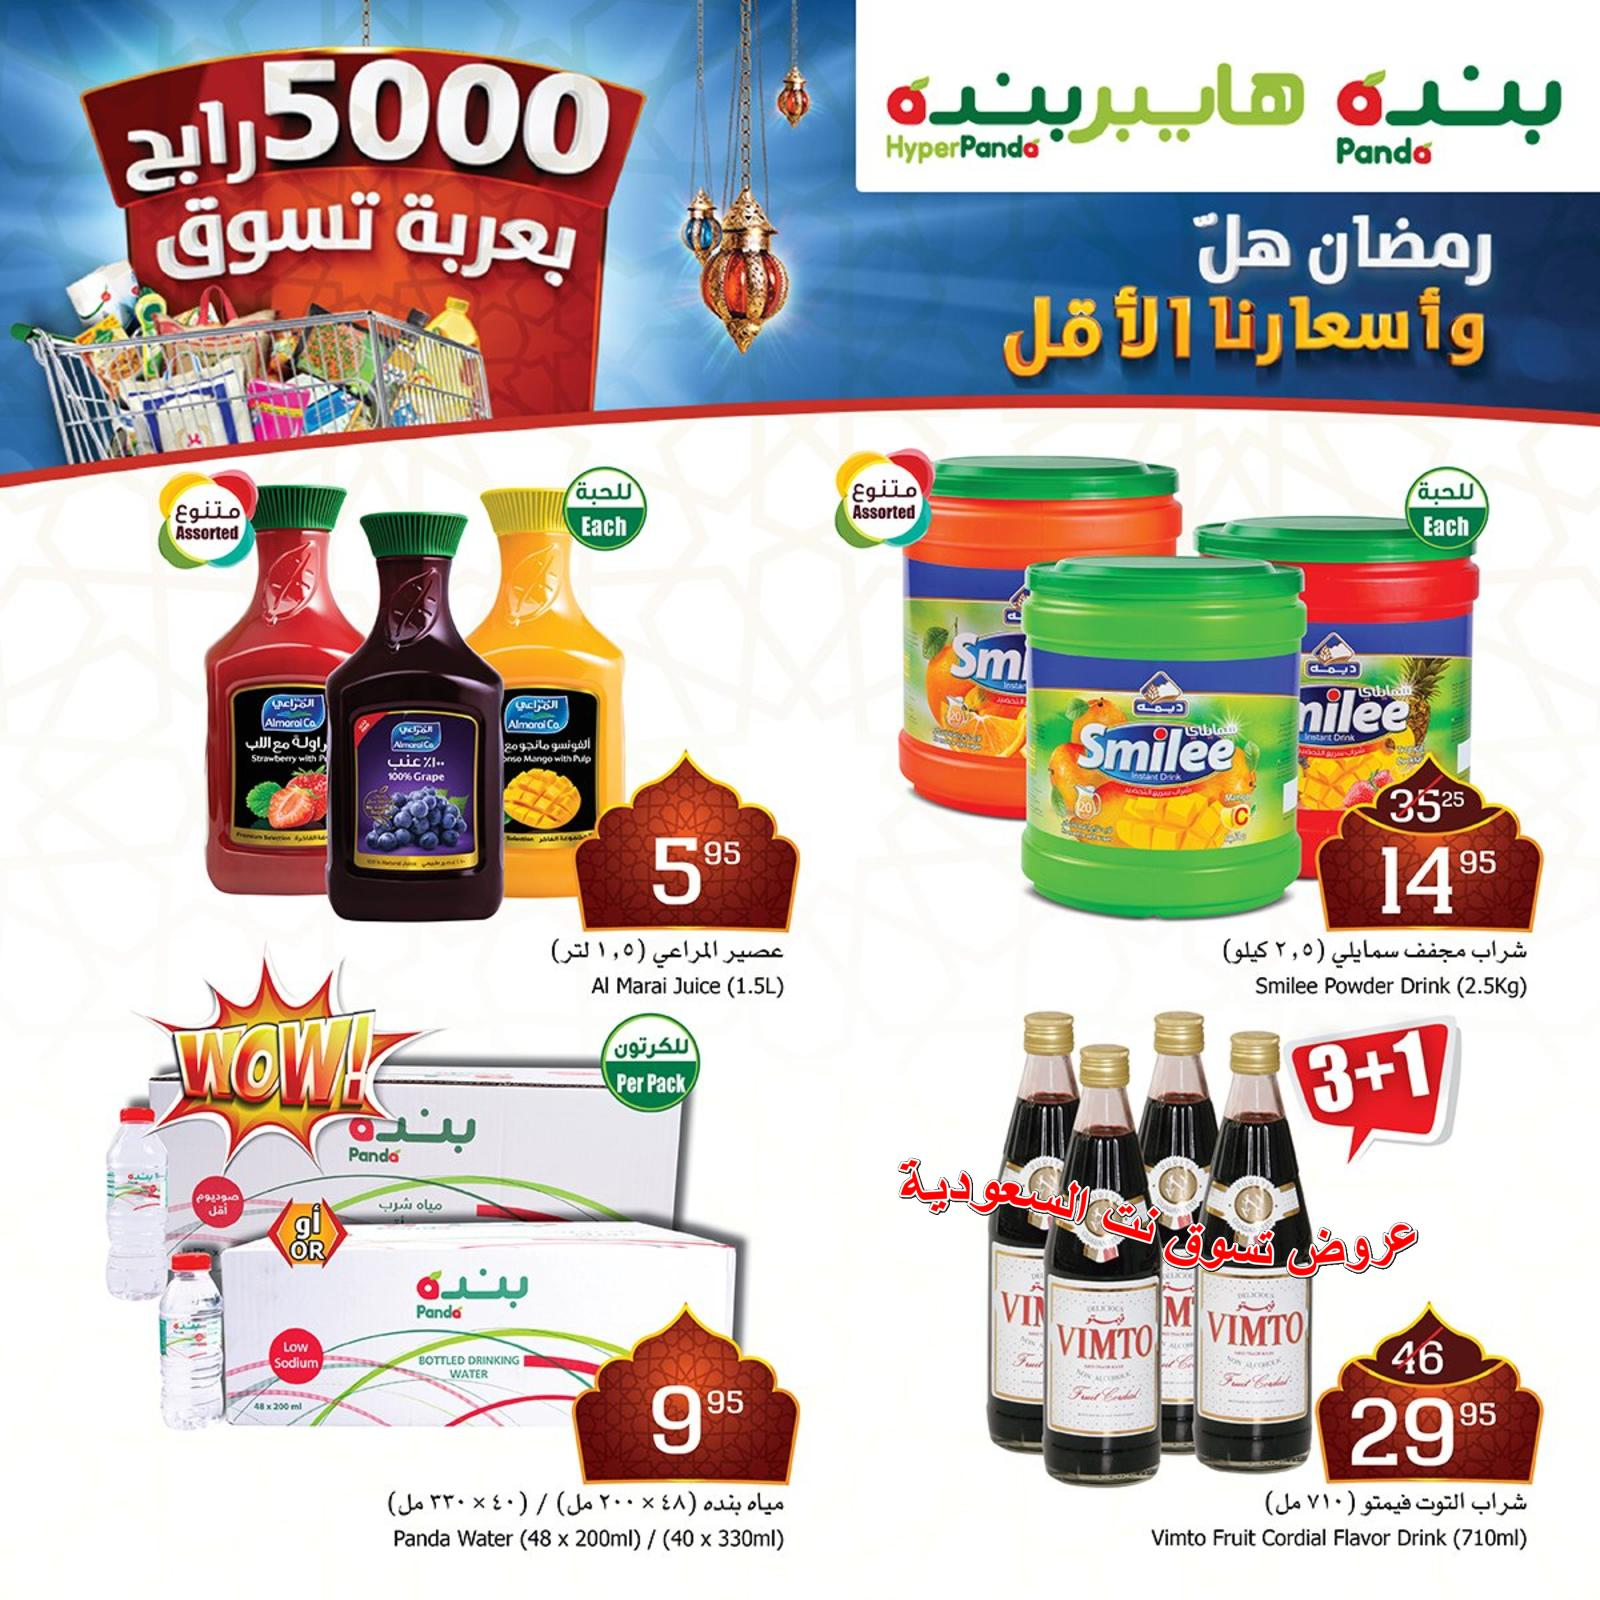 f51c52704 عروض بنده وهايبر بنده السعودية من 21 حتى 24-4-2019 | تسوق نت